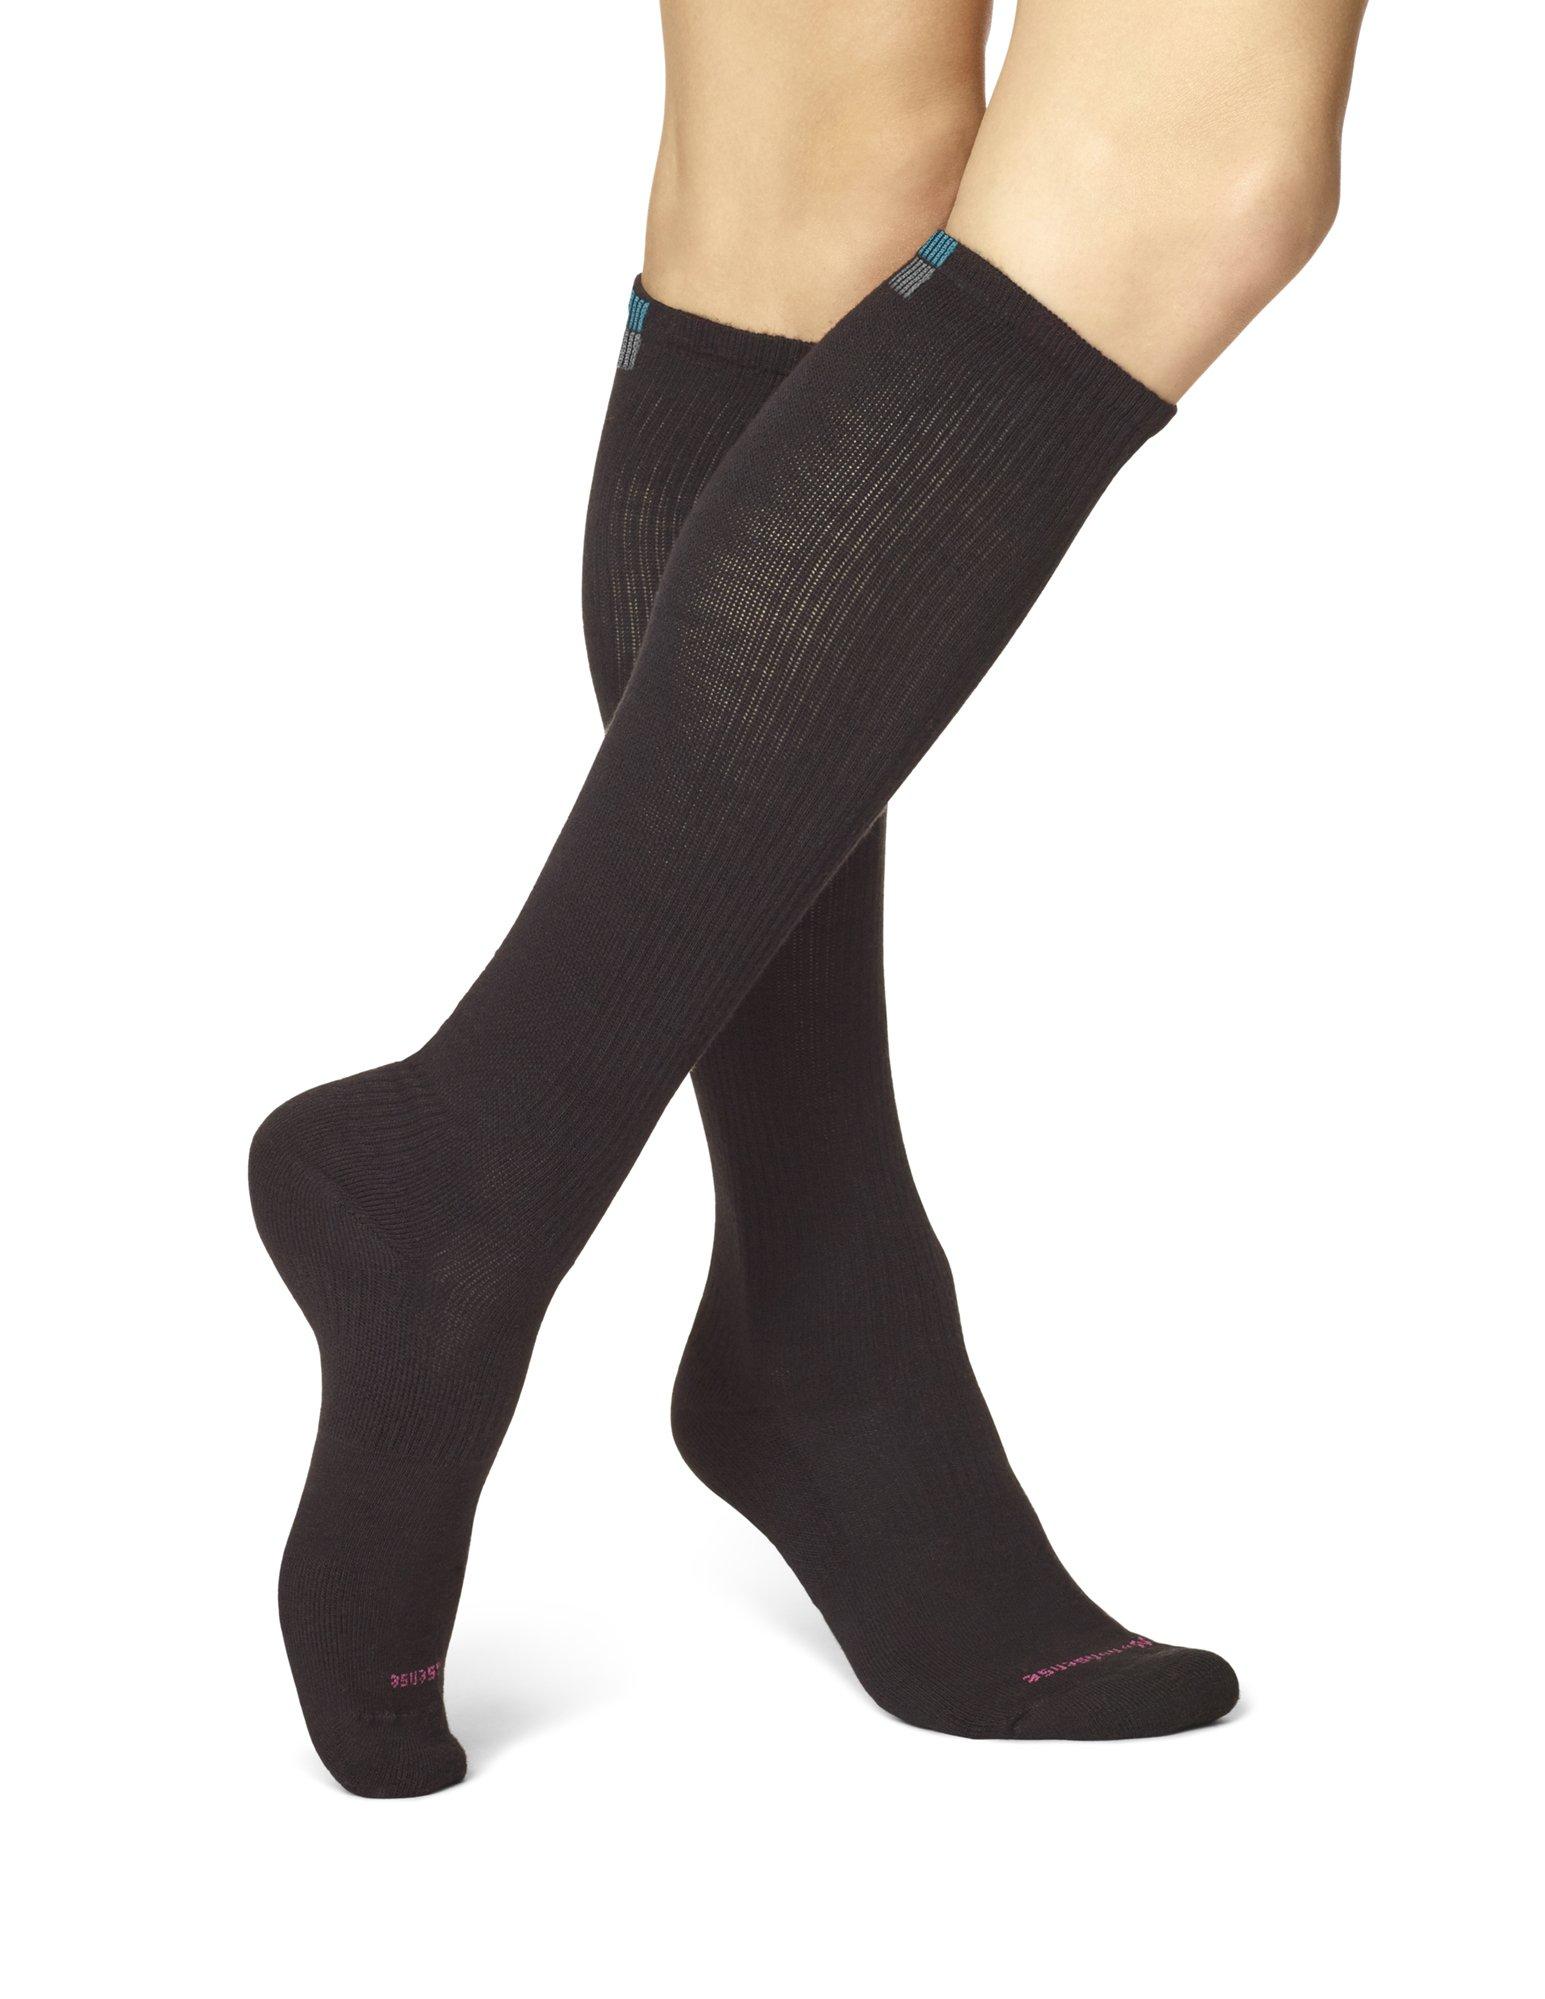 No Nonsense Women's Feel Good Compression Knee High Sock